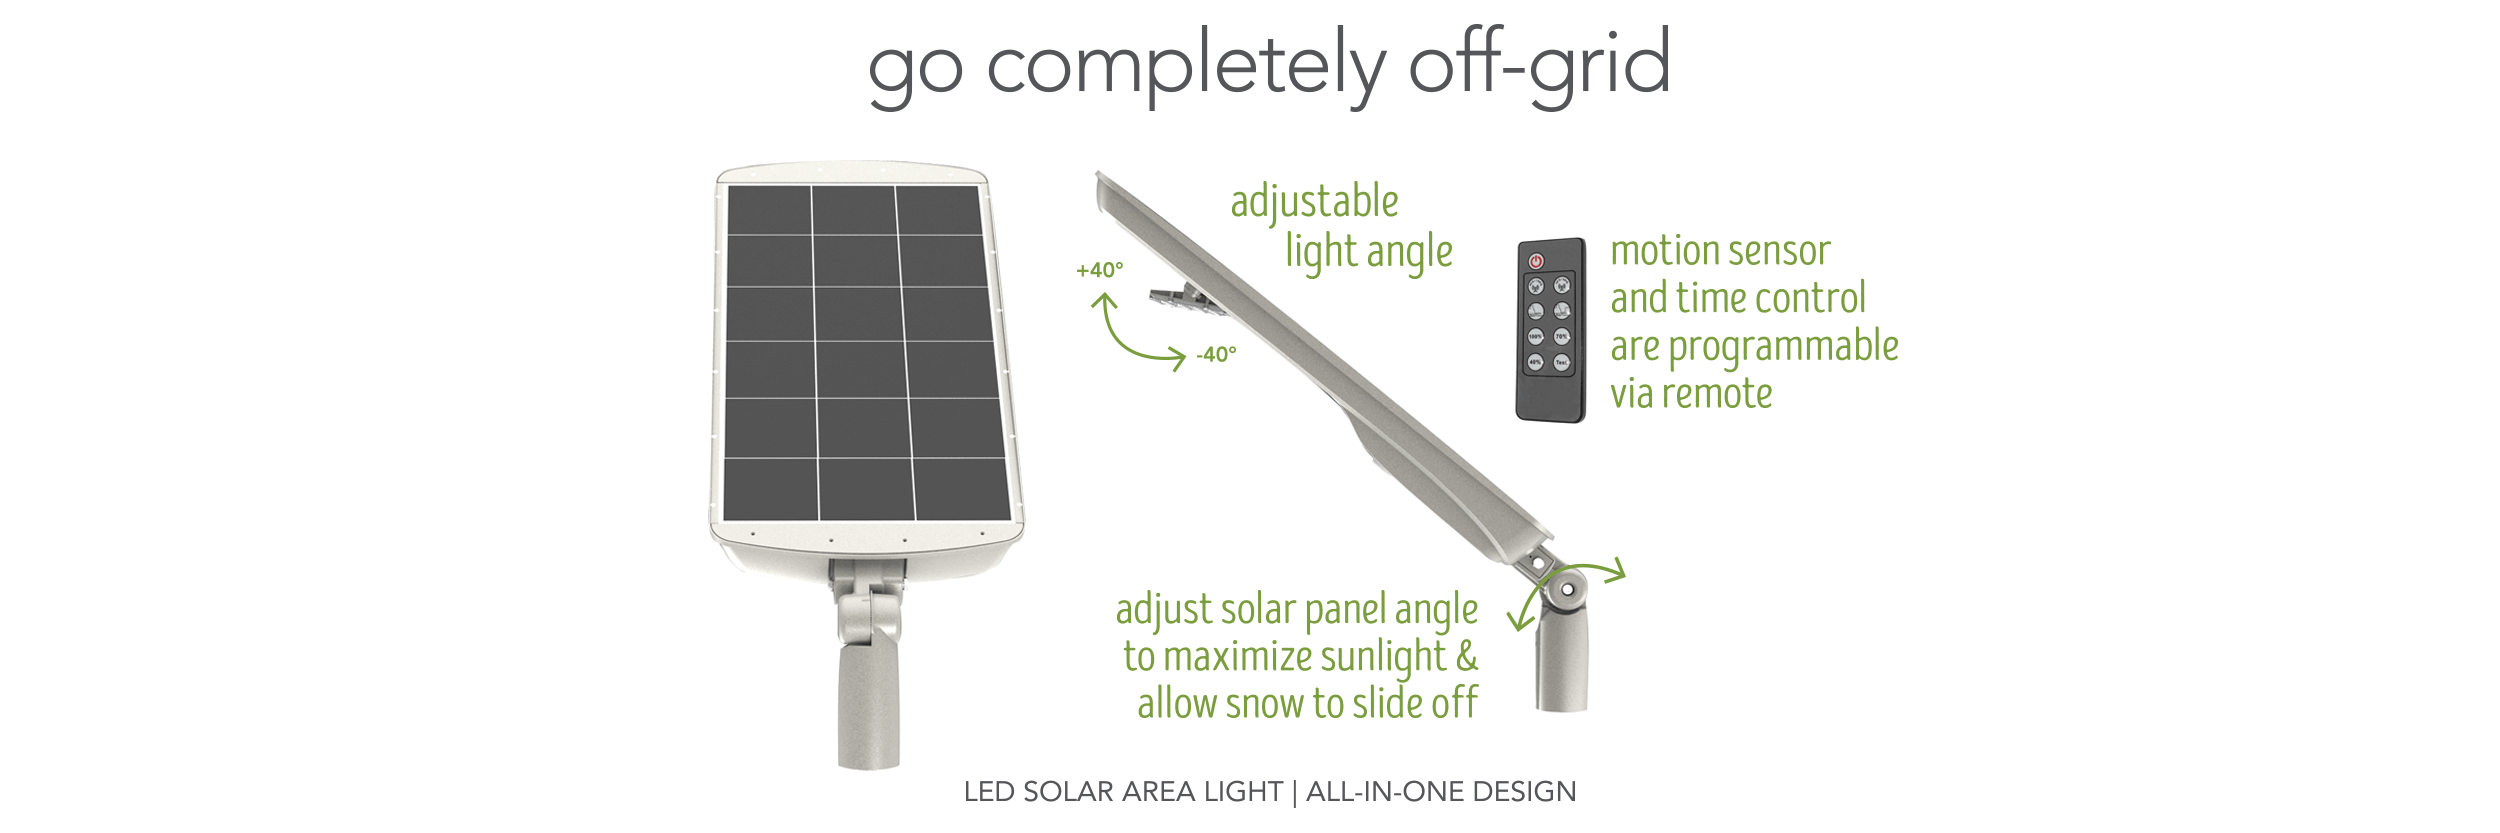 Led Transforming Light Efficient Design For Hid Retrofit Lamps